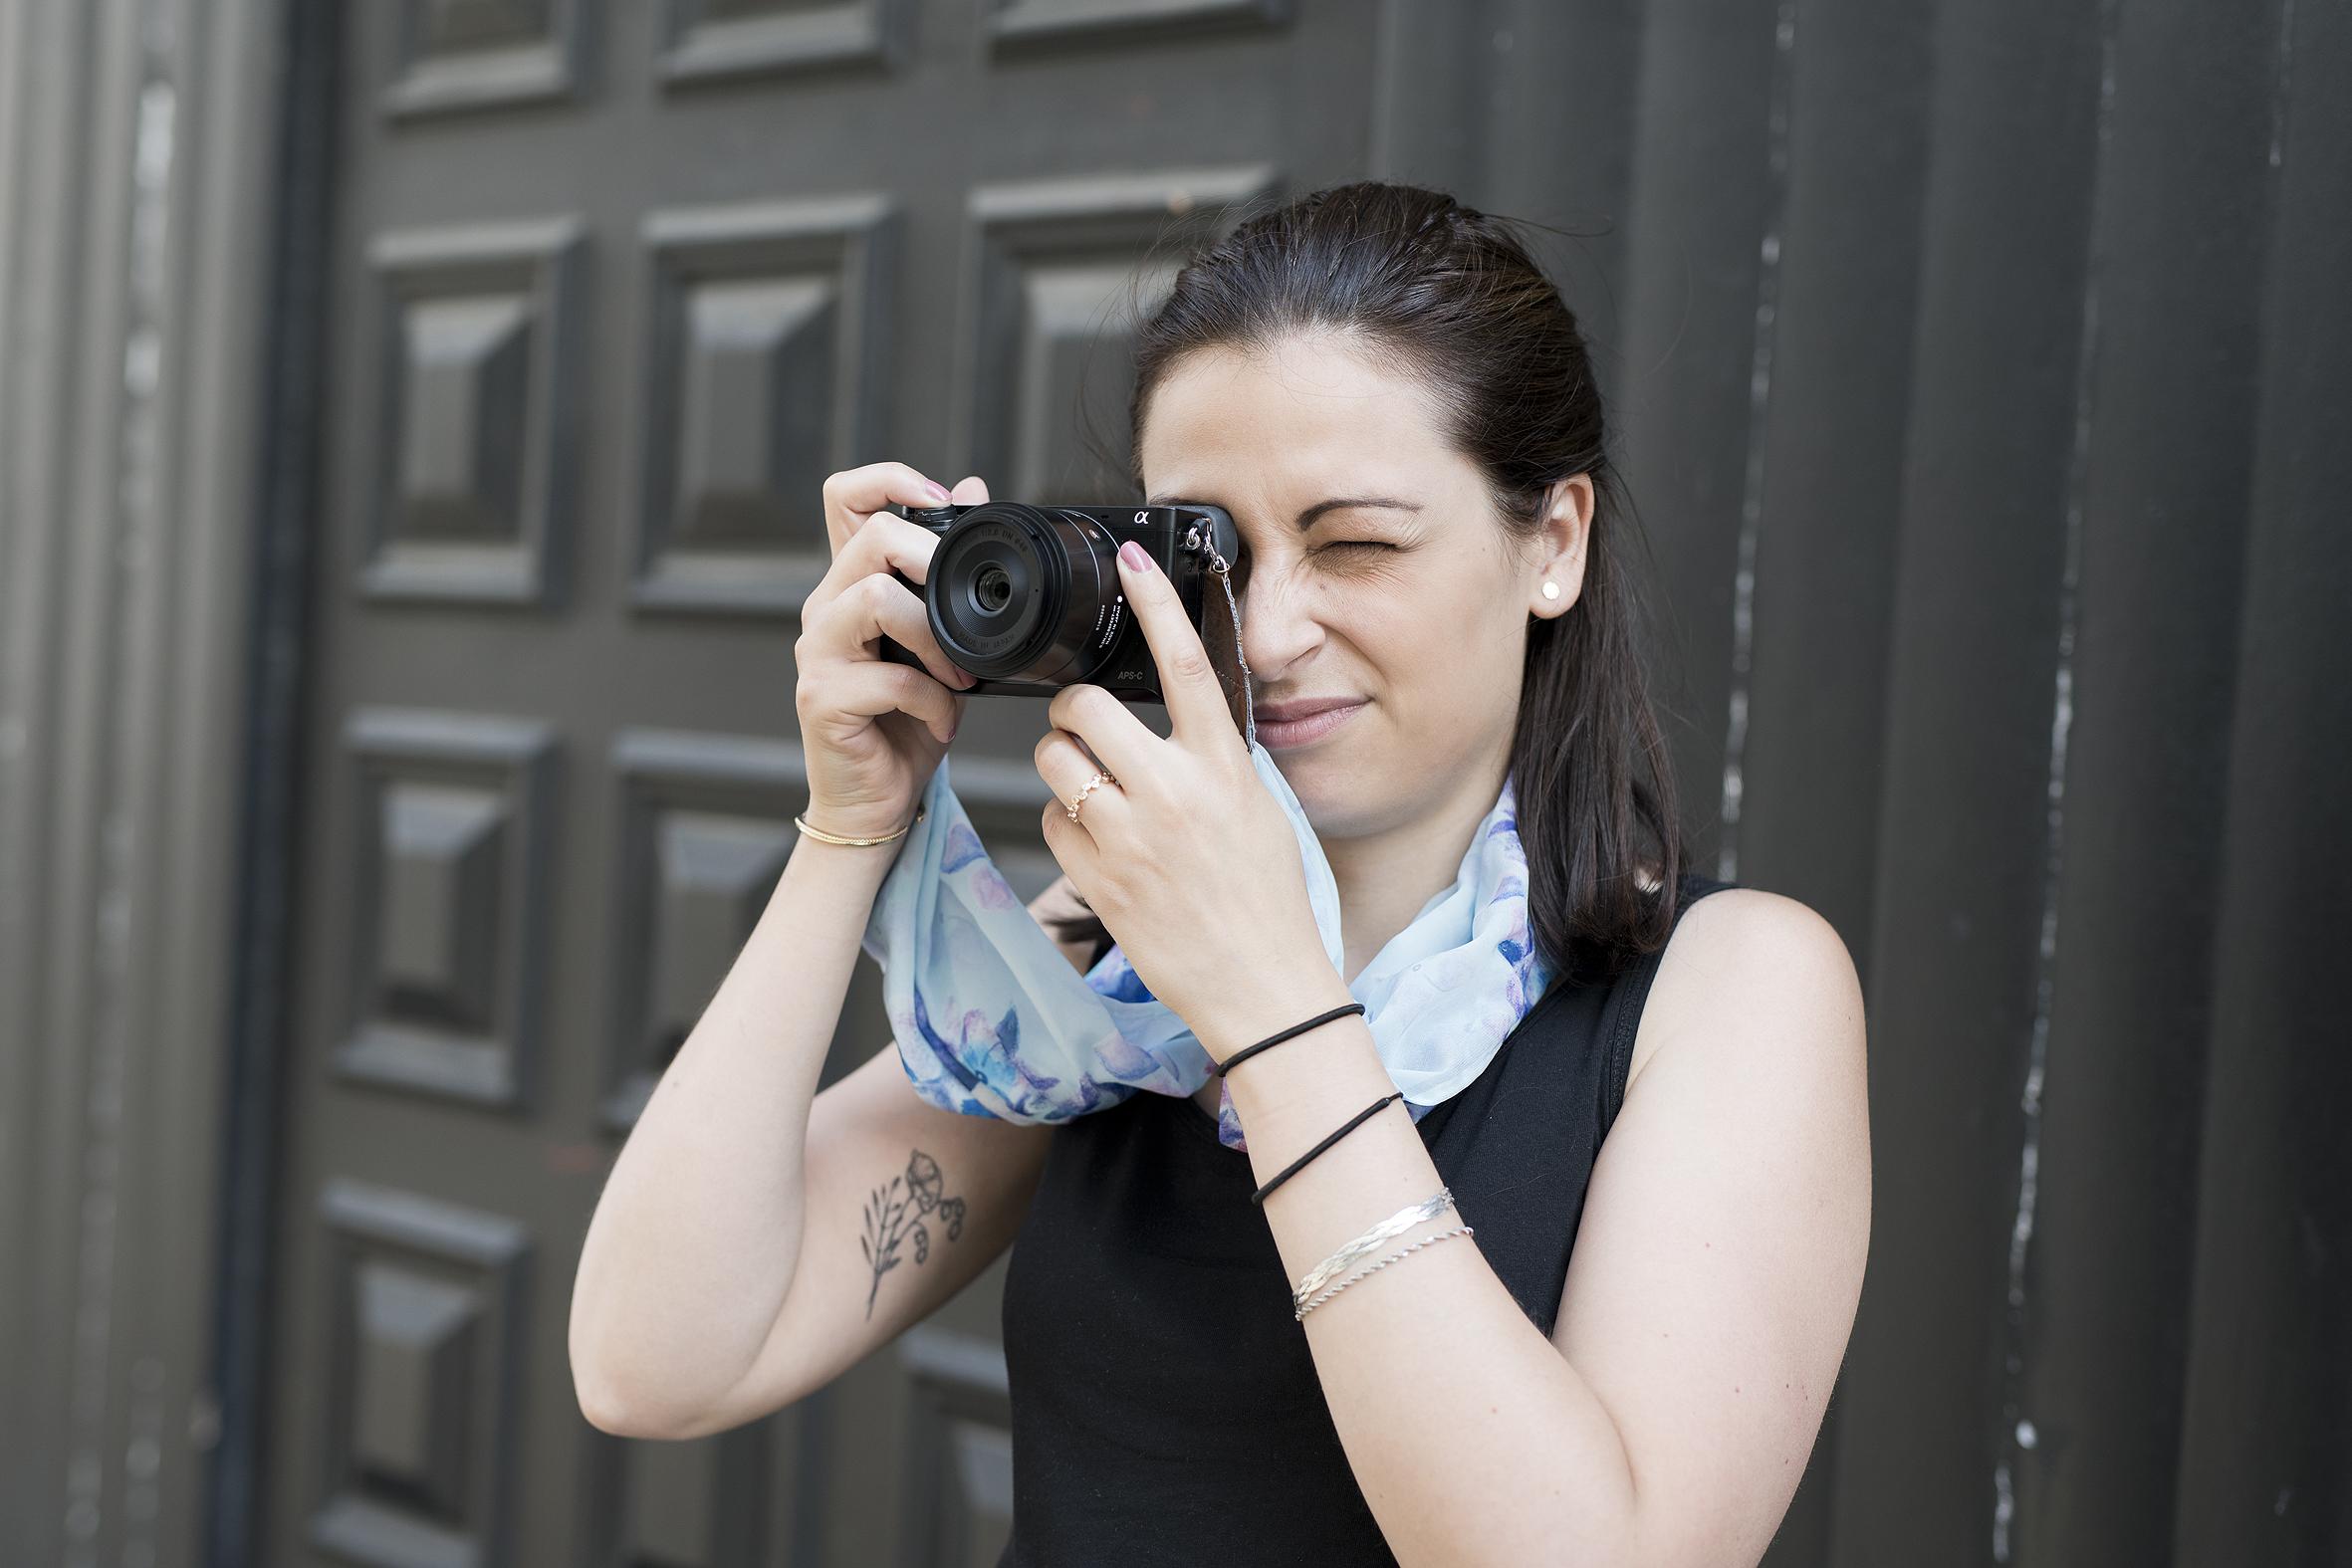 photo, femme, appareil photo, DIY, sangle pour appareil photo, foulard, fait main